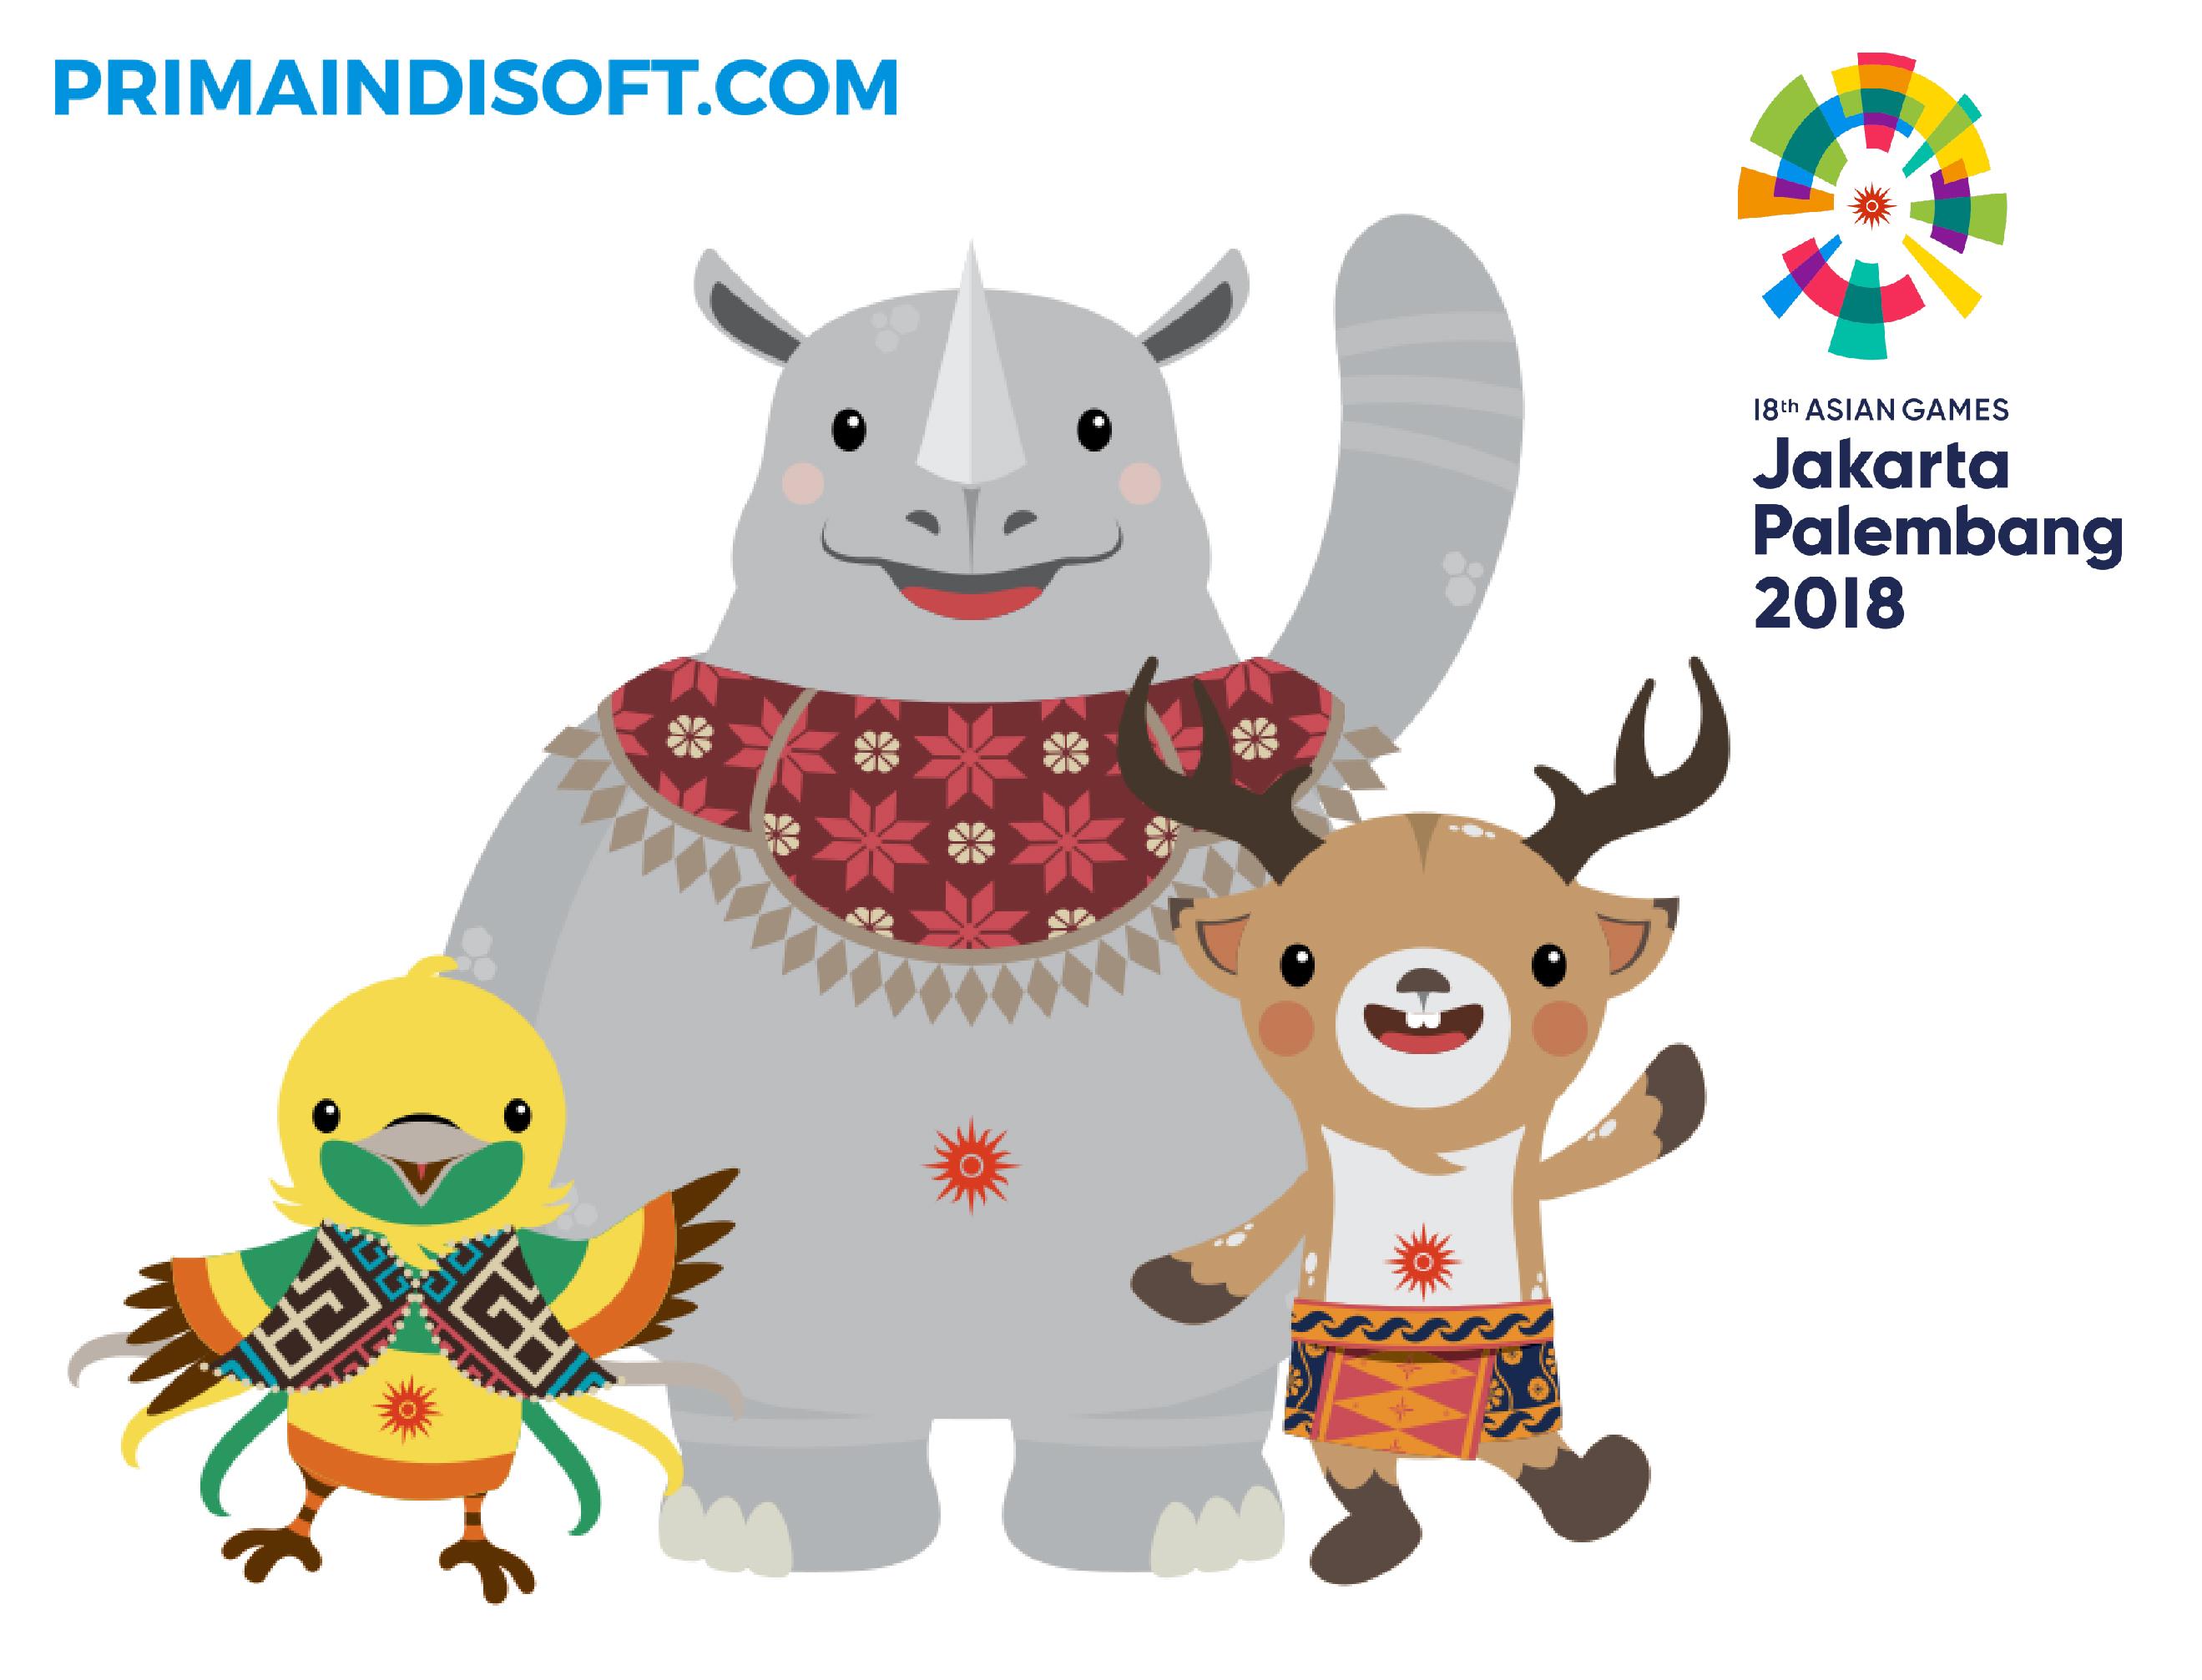 Asian Games 2018 Negara Mana Saja